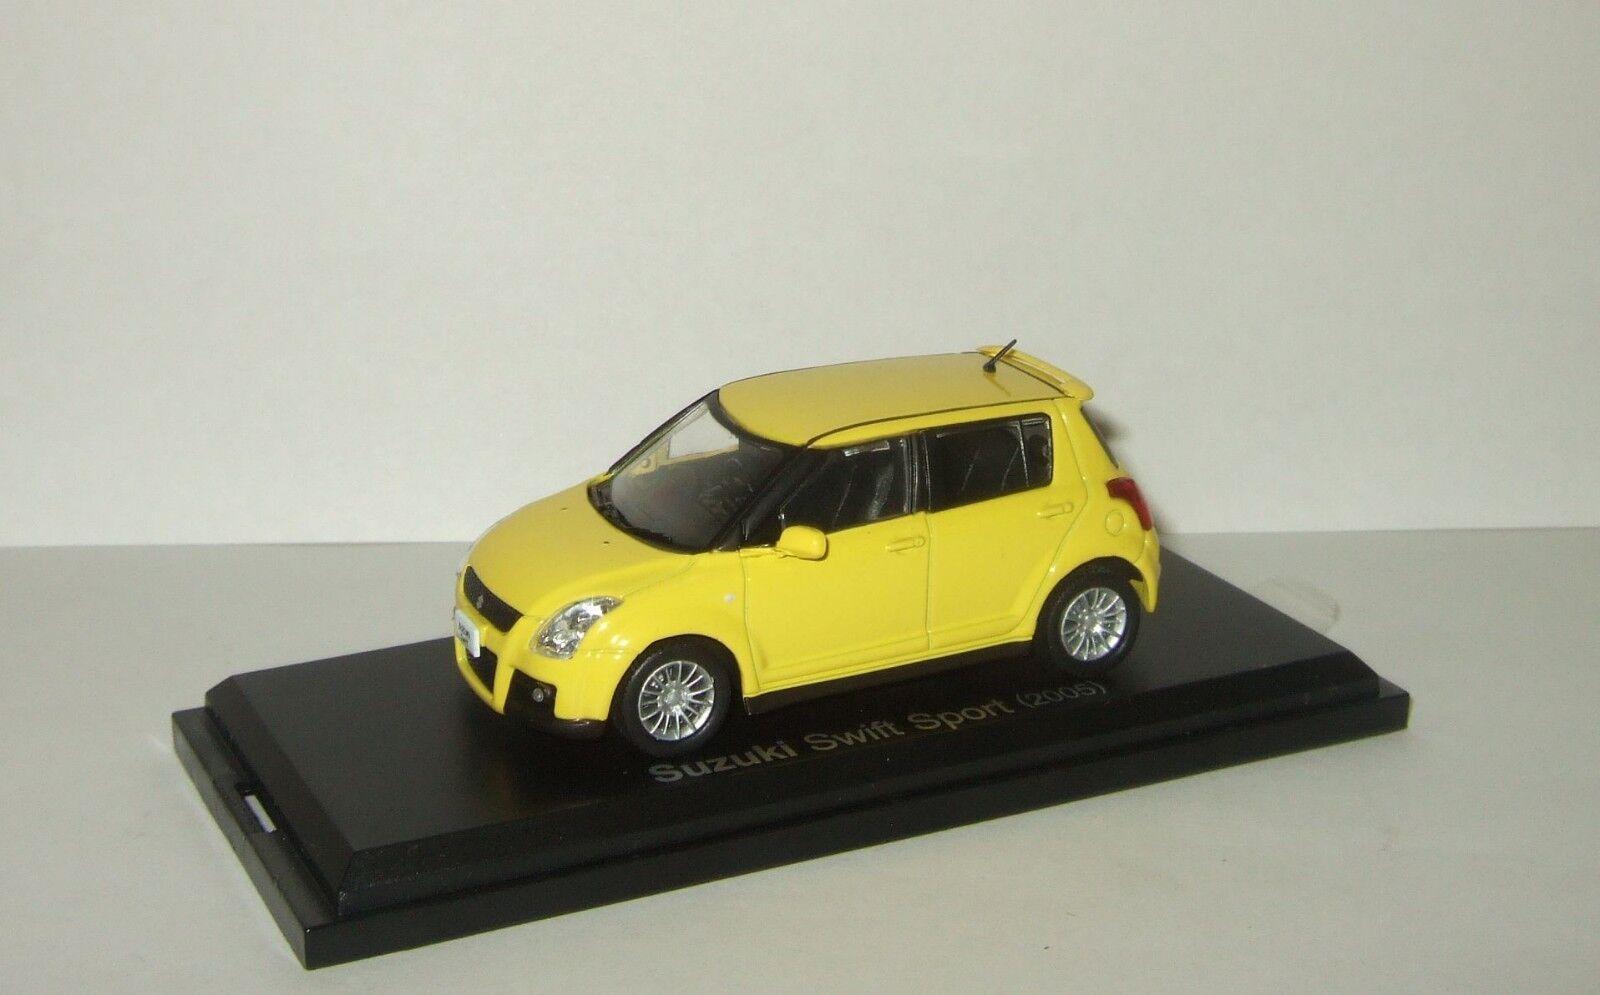 apresurado a ver 1 43 43 43 J-Collection Suzuki Swift Sport 2005  centro comercial de moda